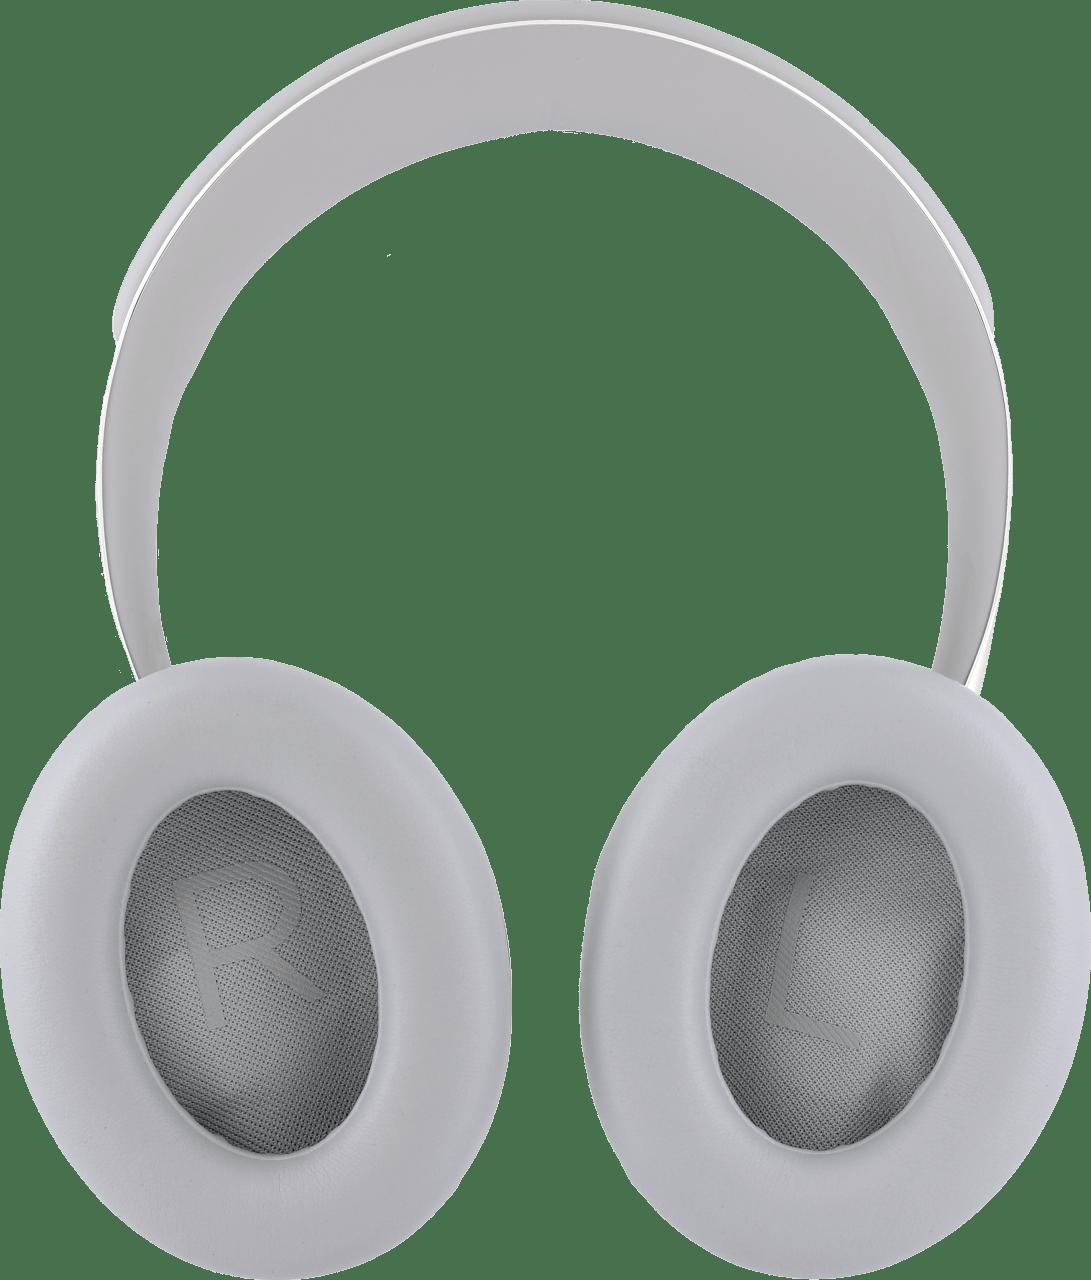 Silver Bose 700 Over-ear Bluetooth Headphones.4